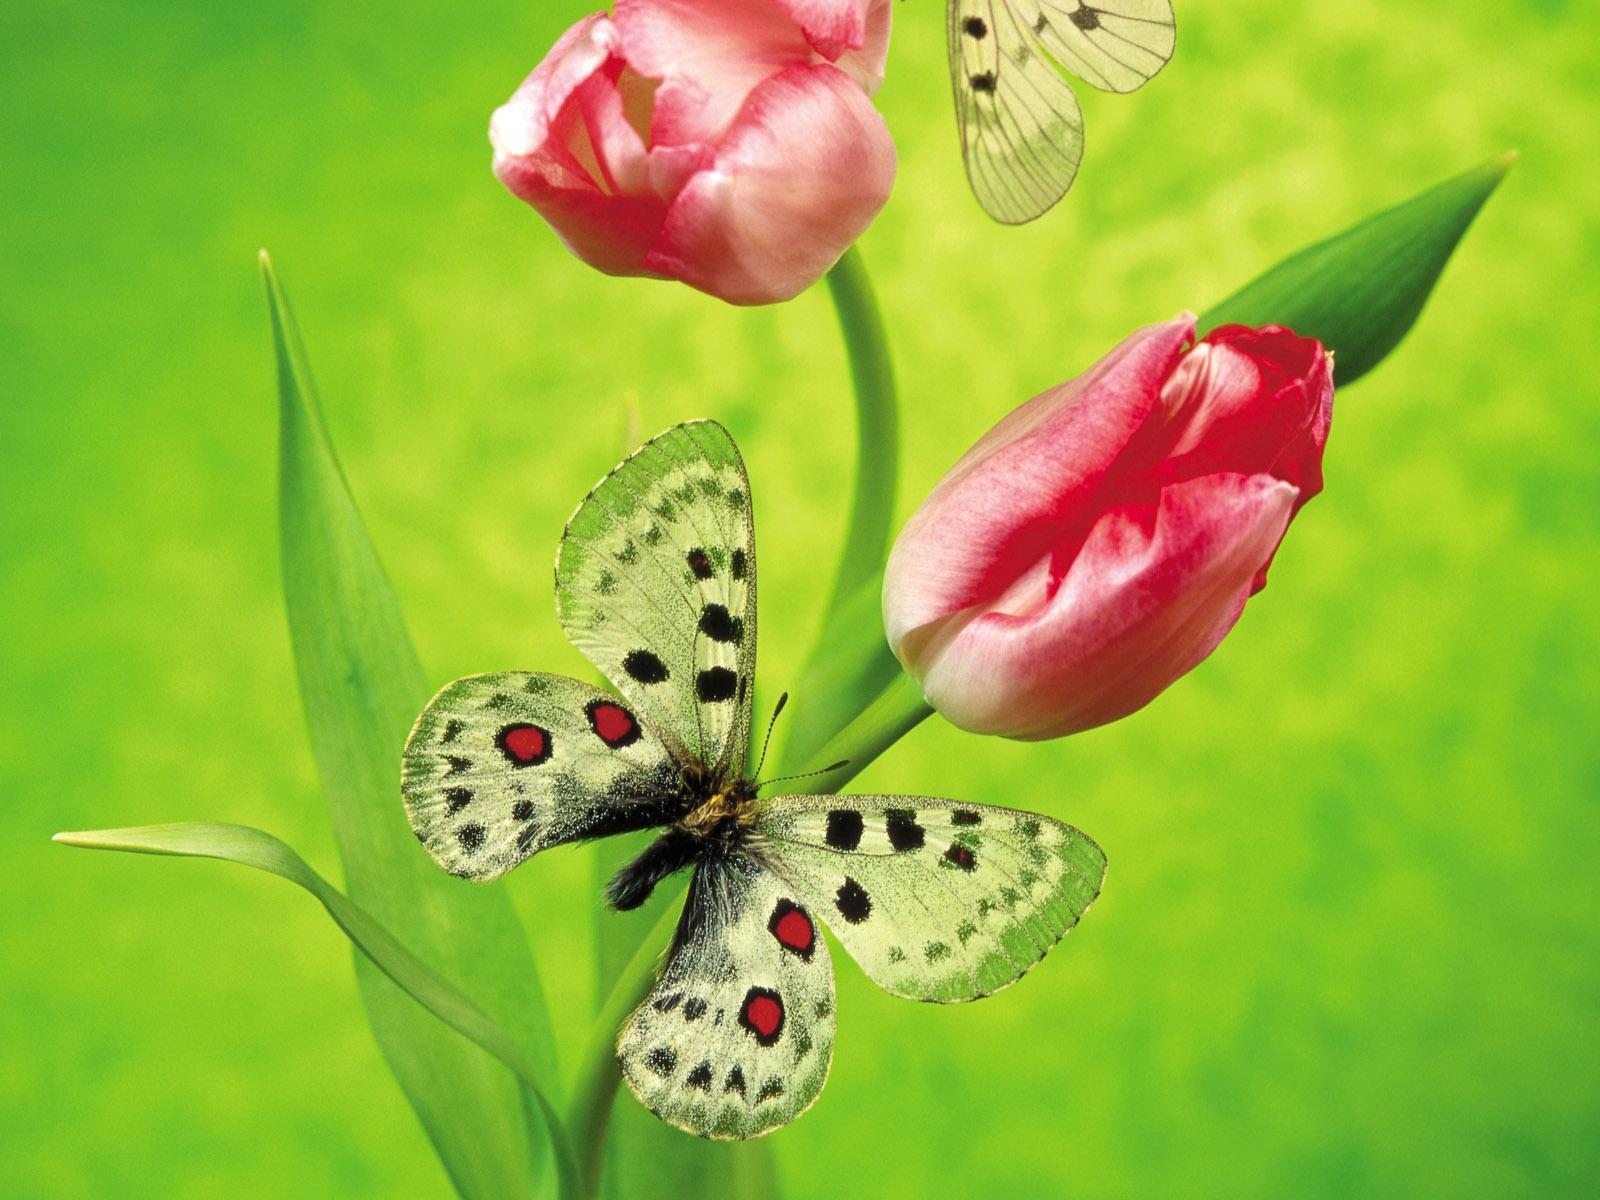 http://2.bp.blogspot.com/-cb0C4w7pjk4/TahdS0-a4zI/AAAAAAAAAWA/4s-1kkBcJHY/s1600/spring+wallpapers_%255Bwww.thewallpaperdb.blogspot.com+%255D_+%252861%2529.jpg